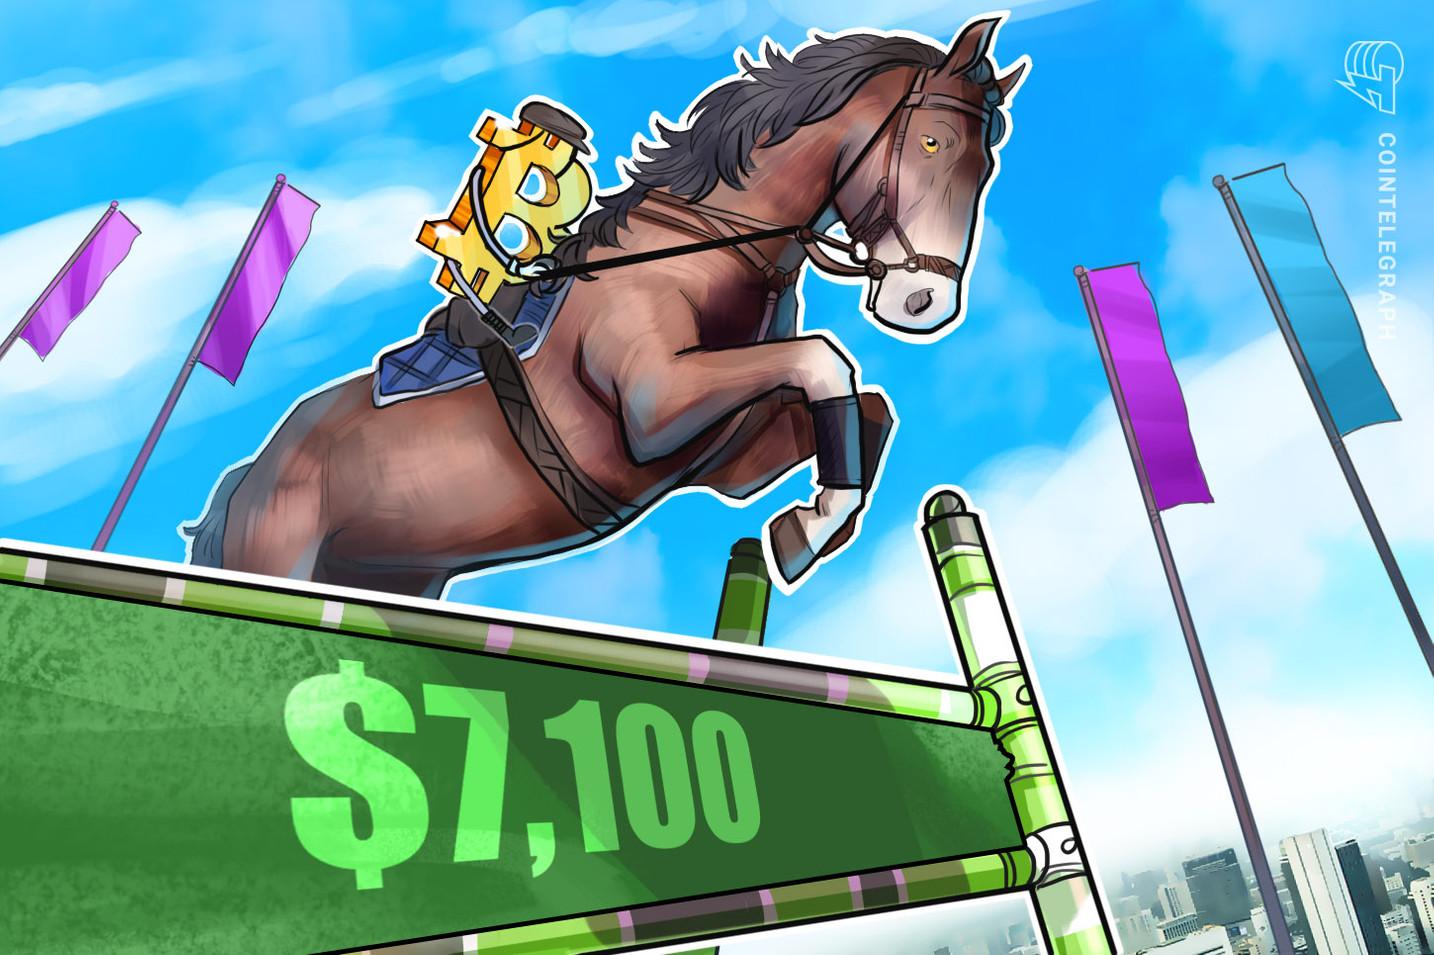 Bitcoin Price Clips $7.1K Futures 'Gap' as Bearish Warnings Persist